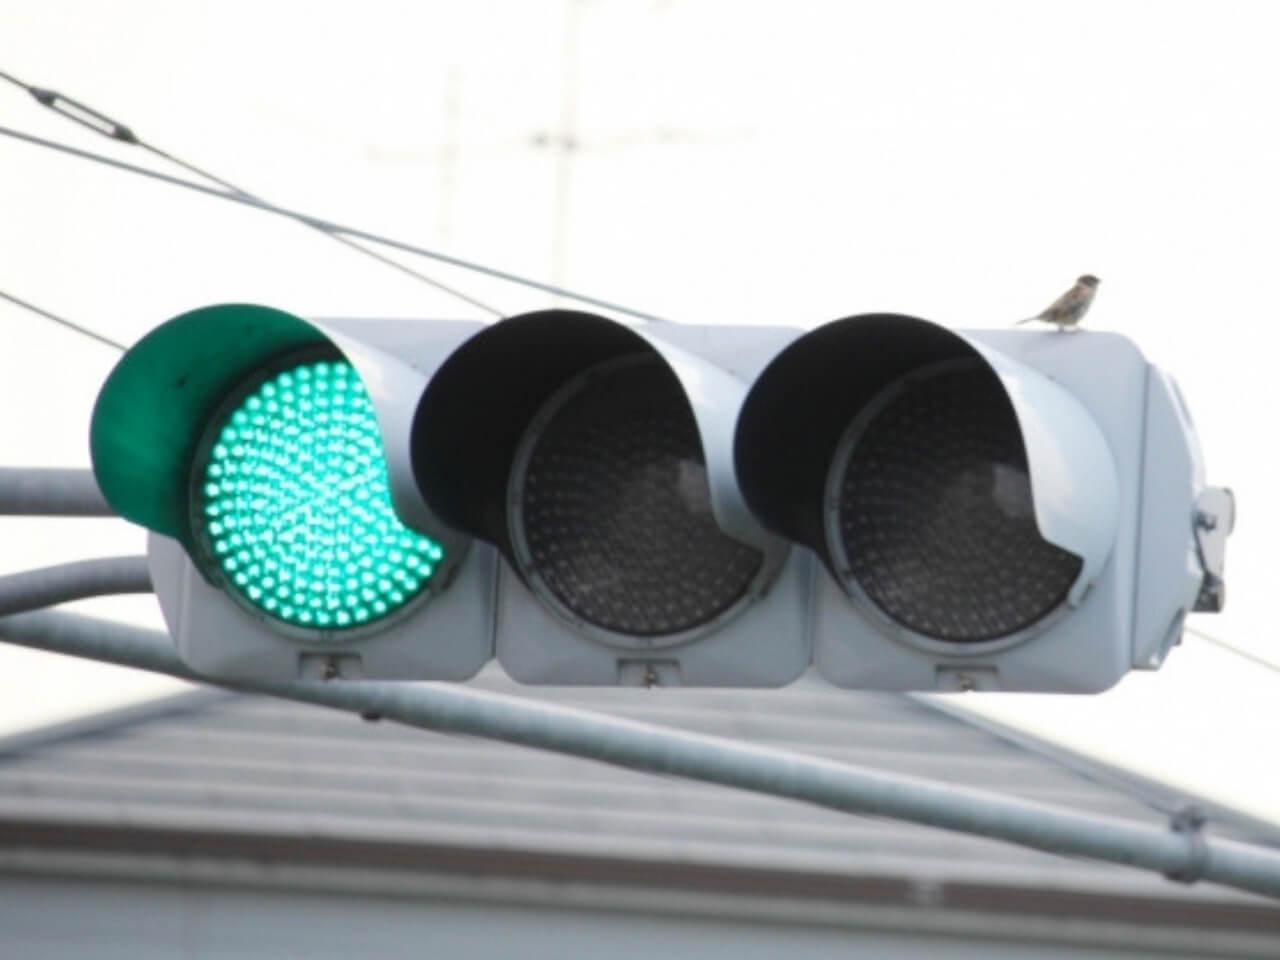 信号機の青信号